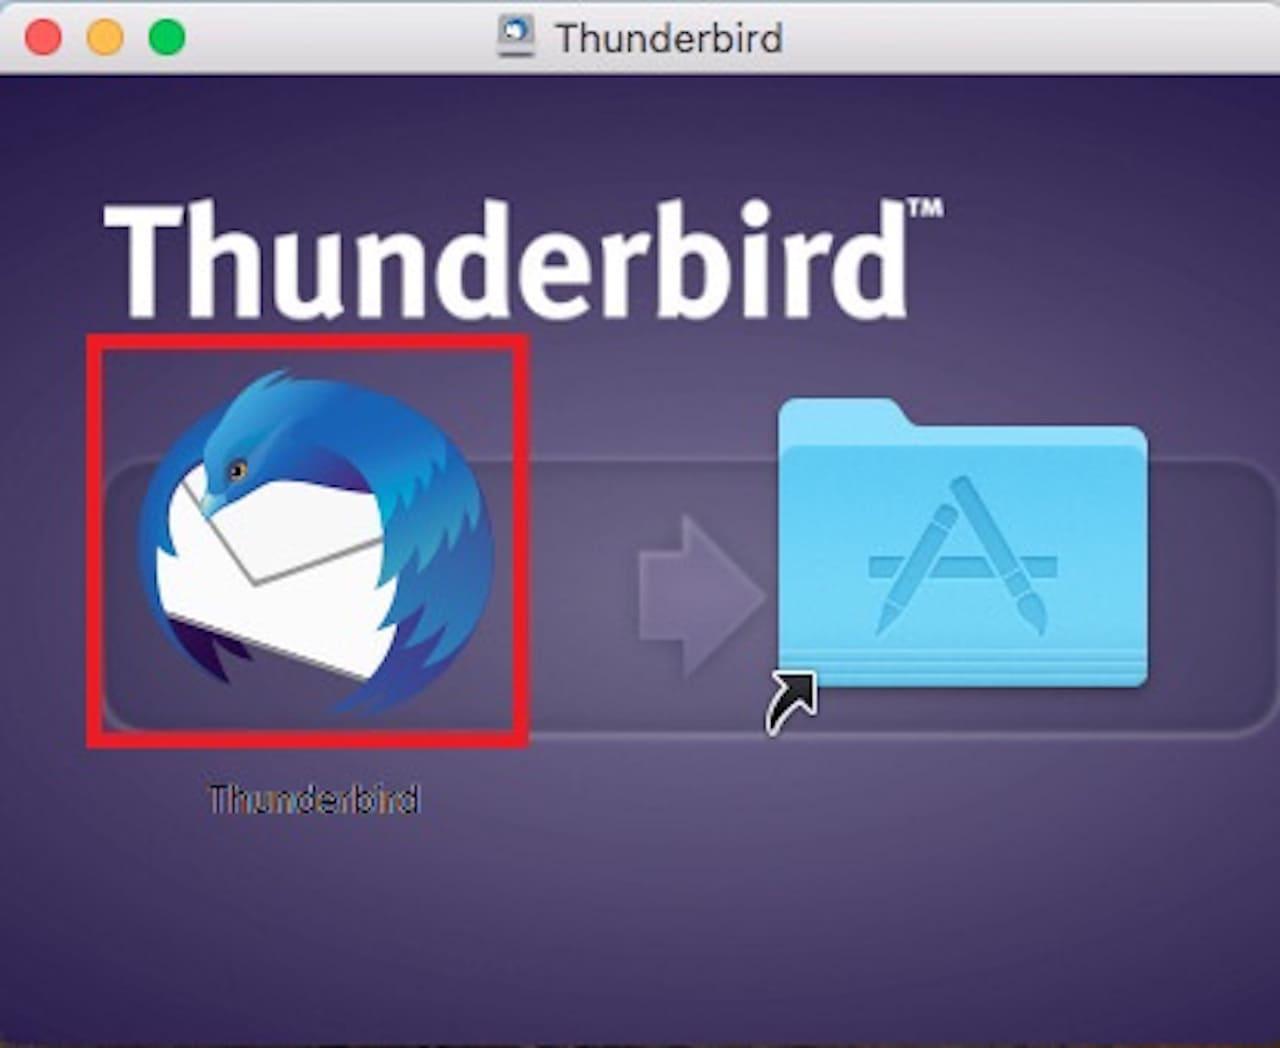 Thunderbirdのインストール方法を画像つきで丁寧に解説